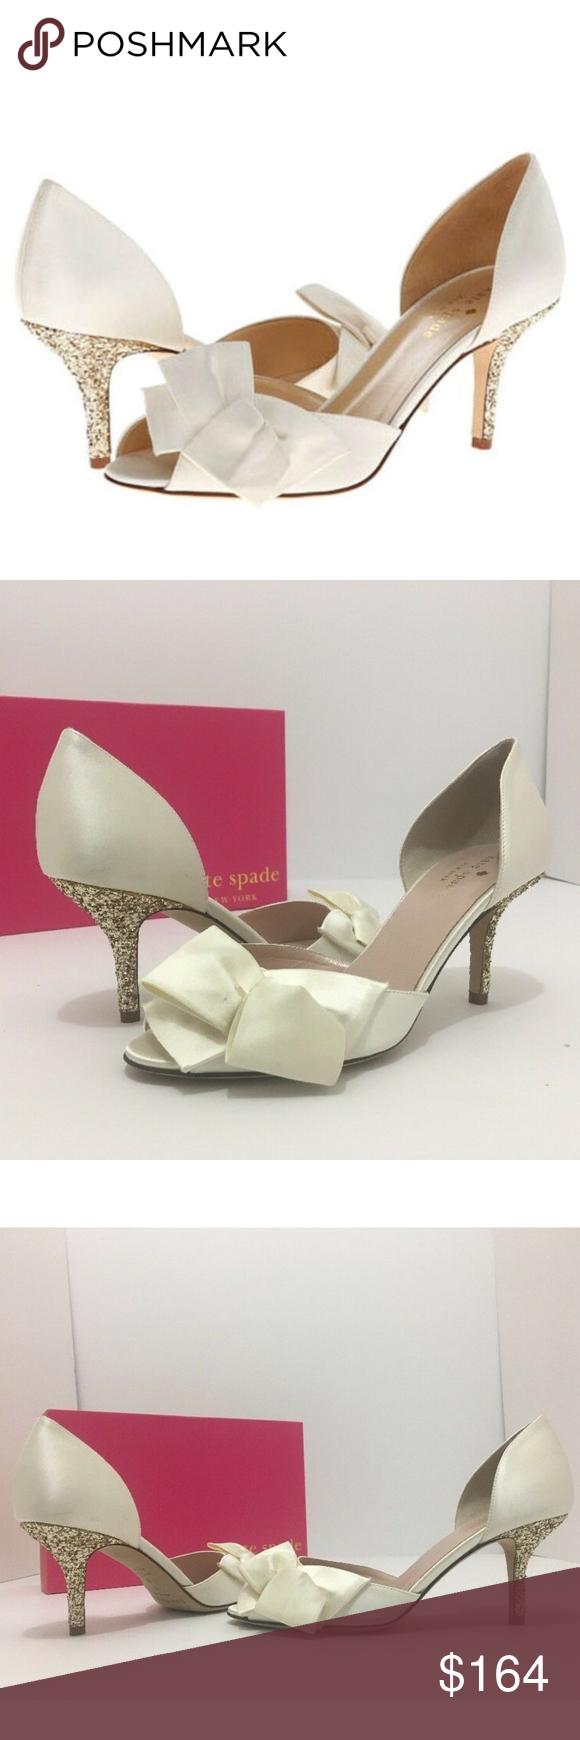 5a265030c288 Kate Spade Bridal Heels Pumps Ivory Shoes 7 M Kate Spade New York Sala Ivory  Satin